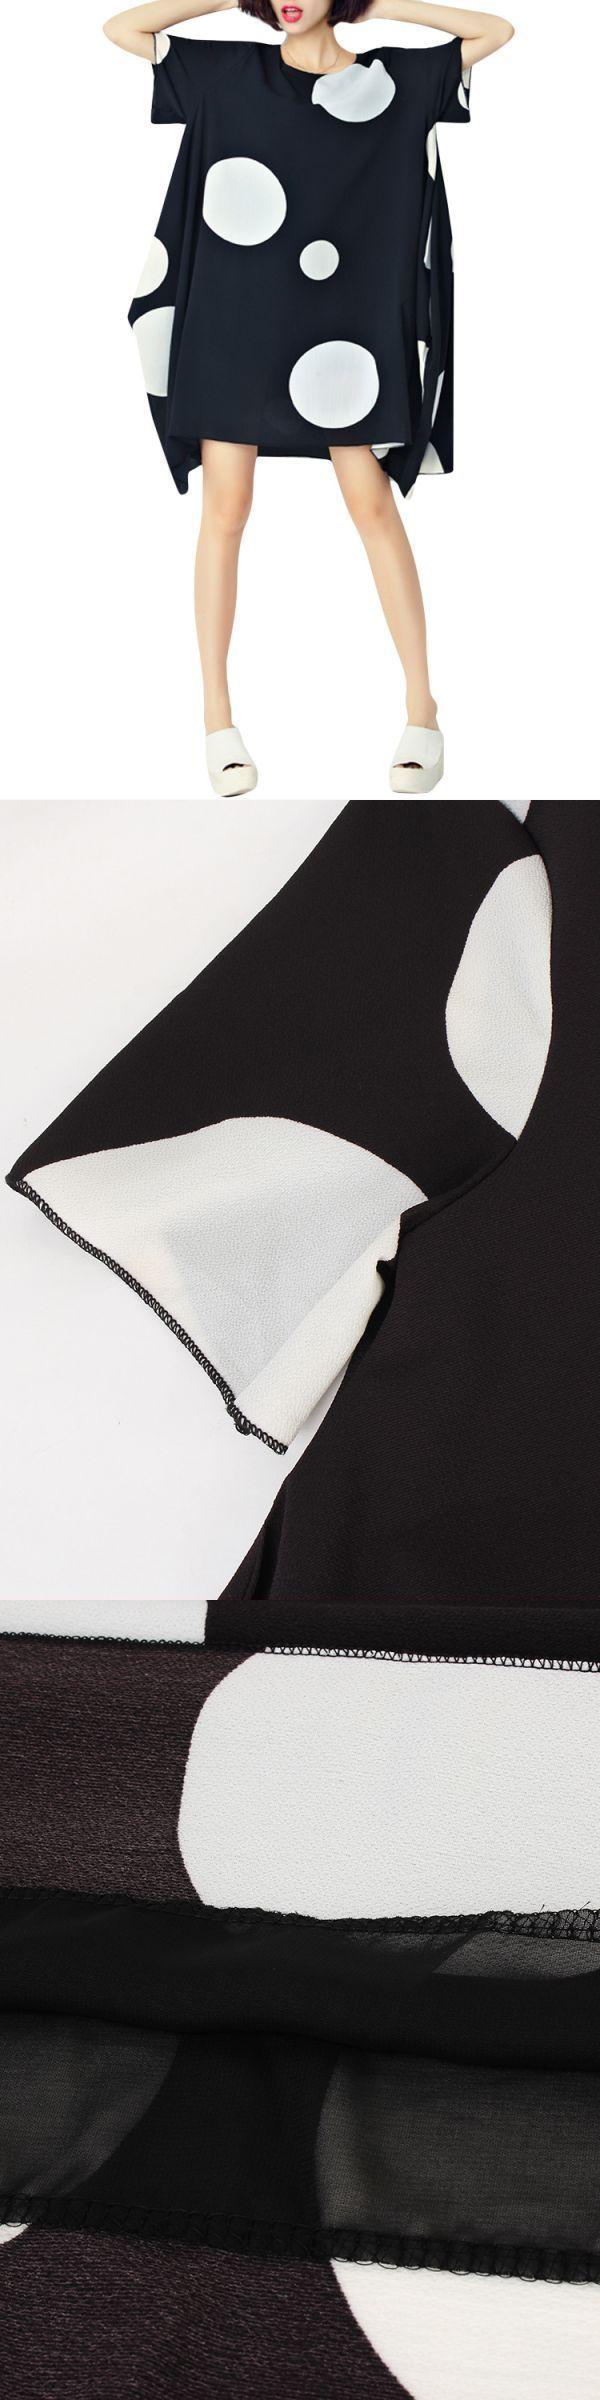 Jcpenney chiffon dresses loose women short sleeve polka dot irregular hem chiffon t-shirt #chiffon #dresses #2015 #chiffon #dresses #pictures #chiffon #dresses #pinterest #chiffon #dresses #with #slits